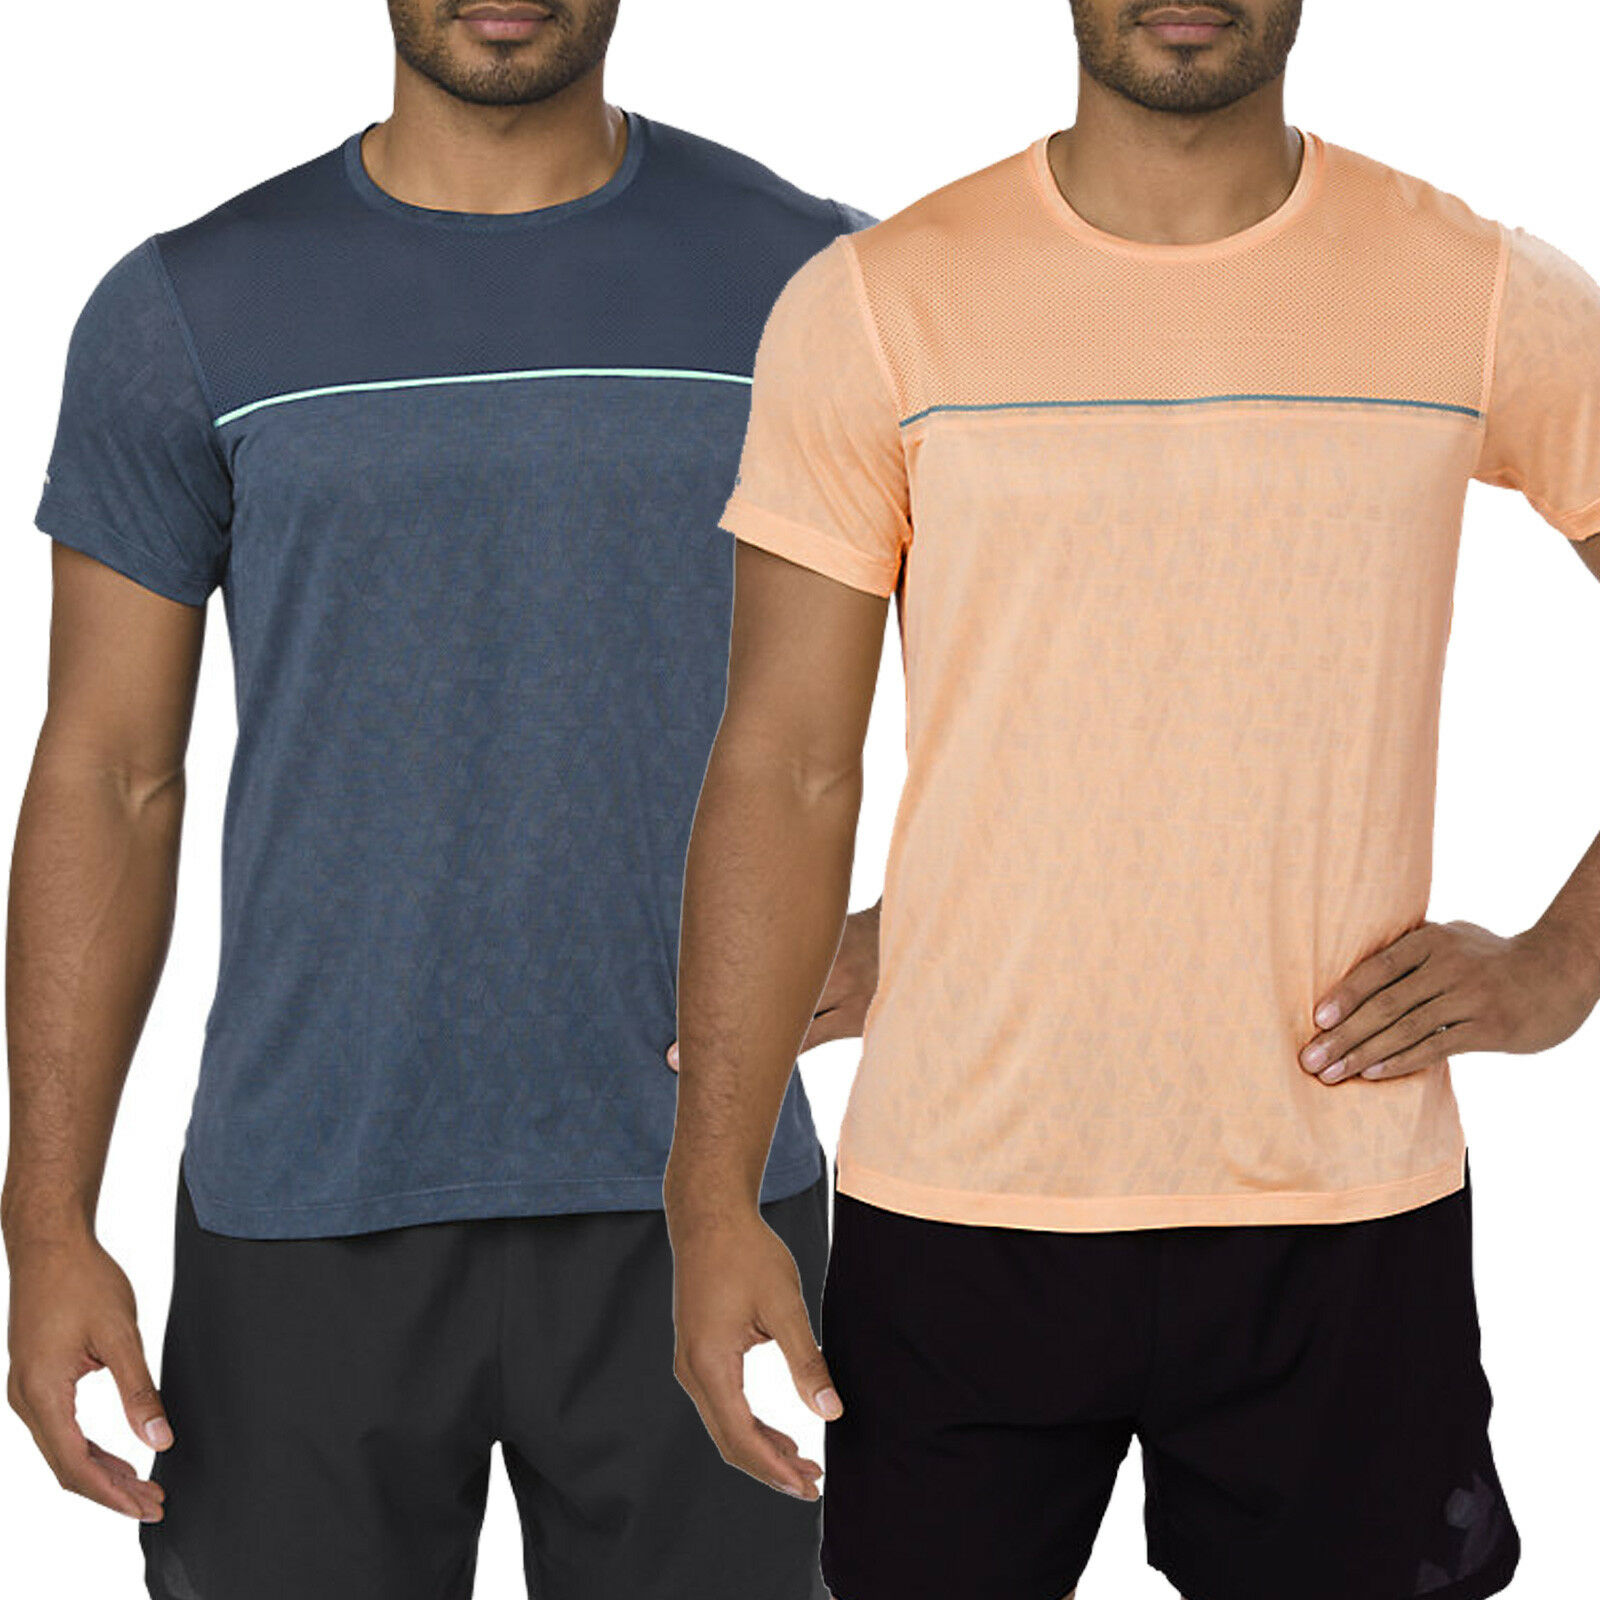 ASICS PERFORMANCE GEL-COOL UOMO-CORSA A Maniche Corte Shirt-Maglietta Sport Camicia Funzione